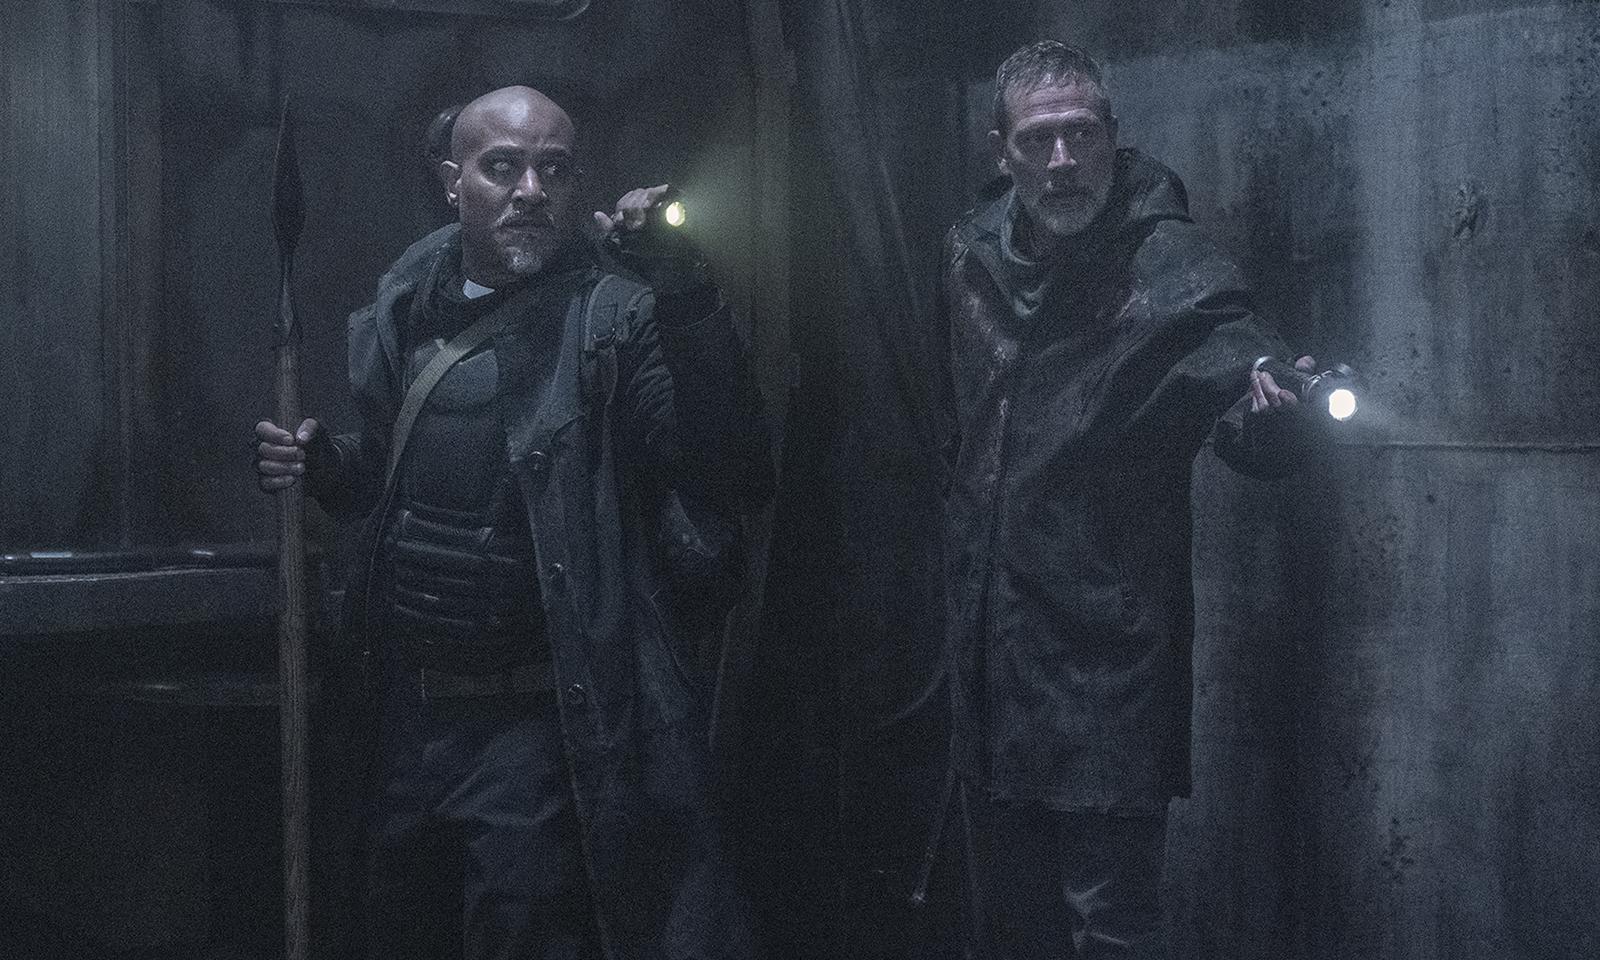 Gabriel e Negan apontando lanternas para algo no metrô do episódio 1 da 11ª e última temporada de The Walking Dead.